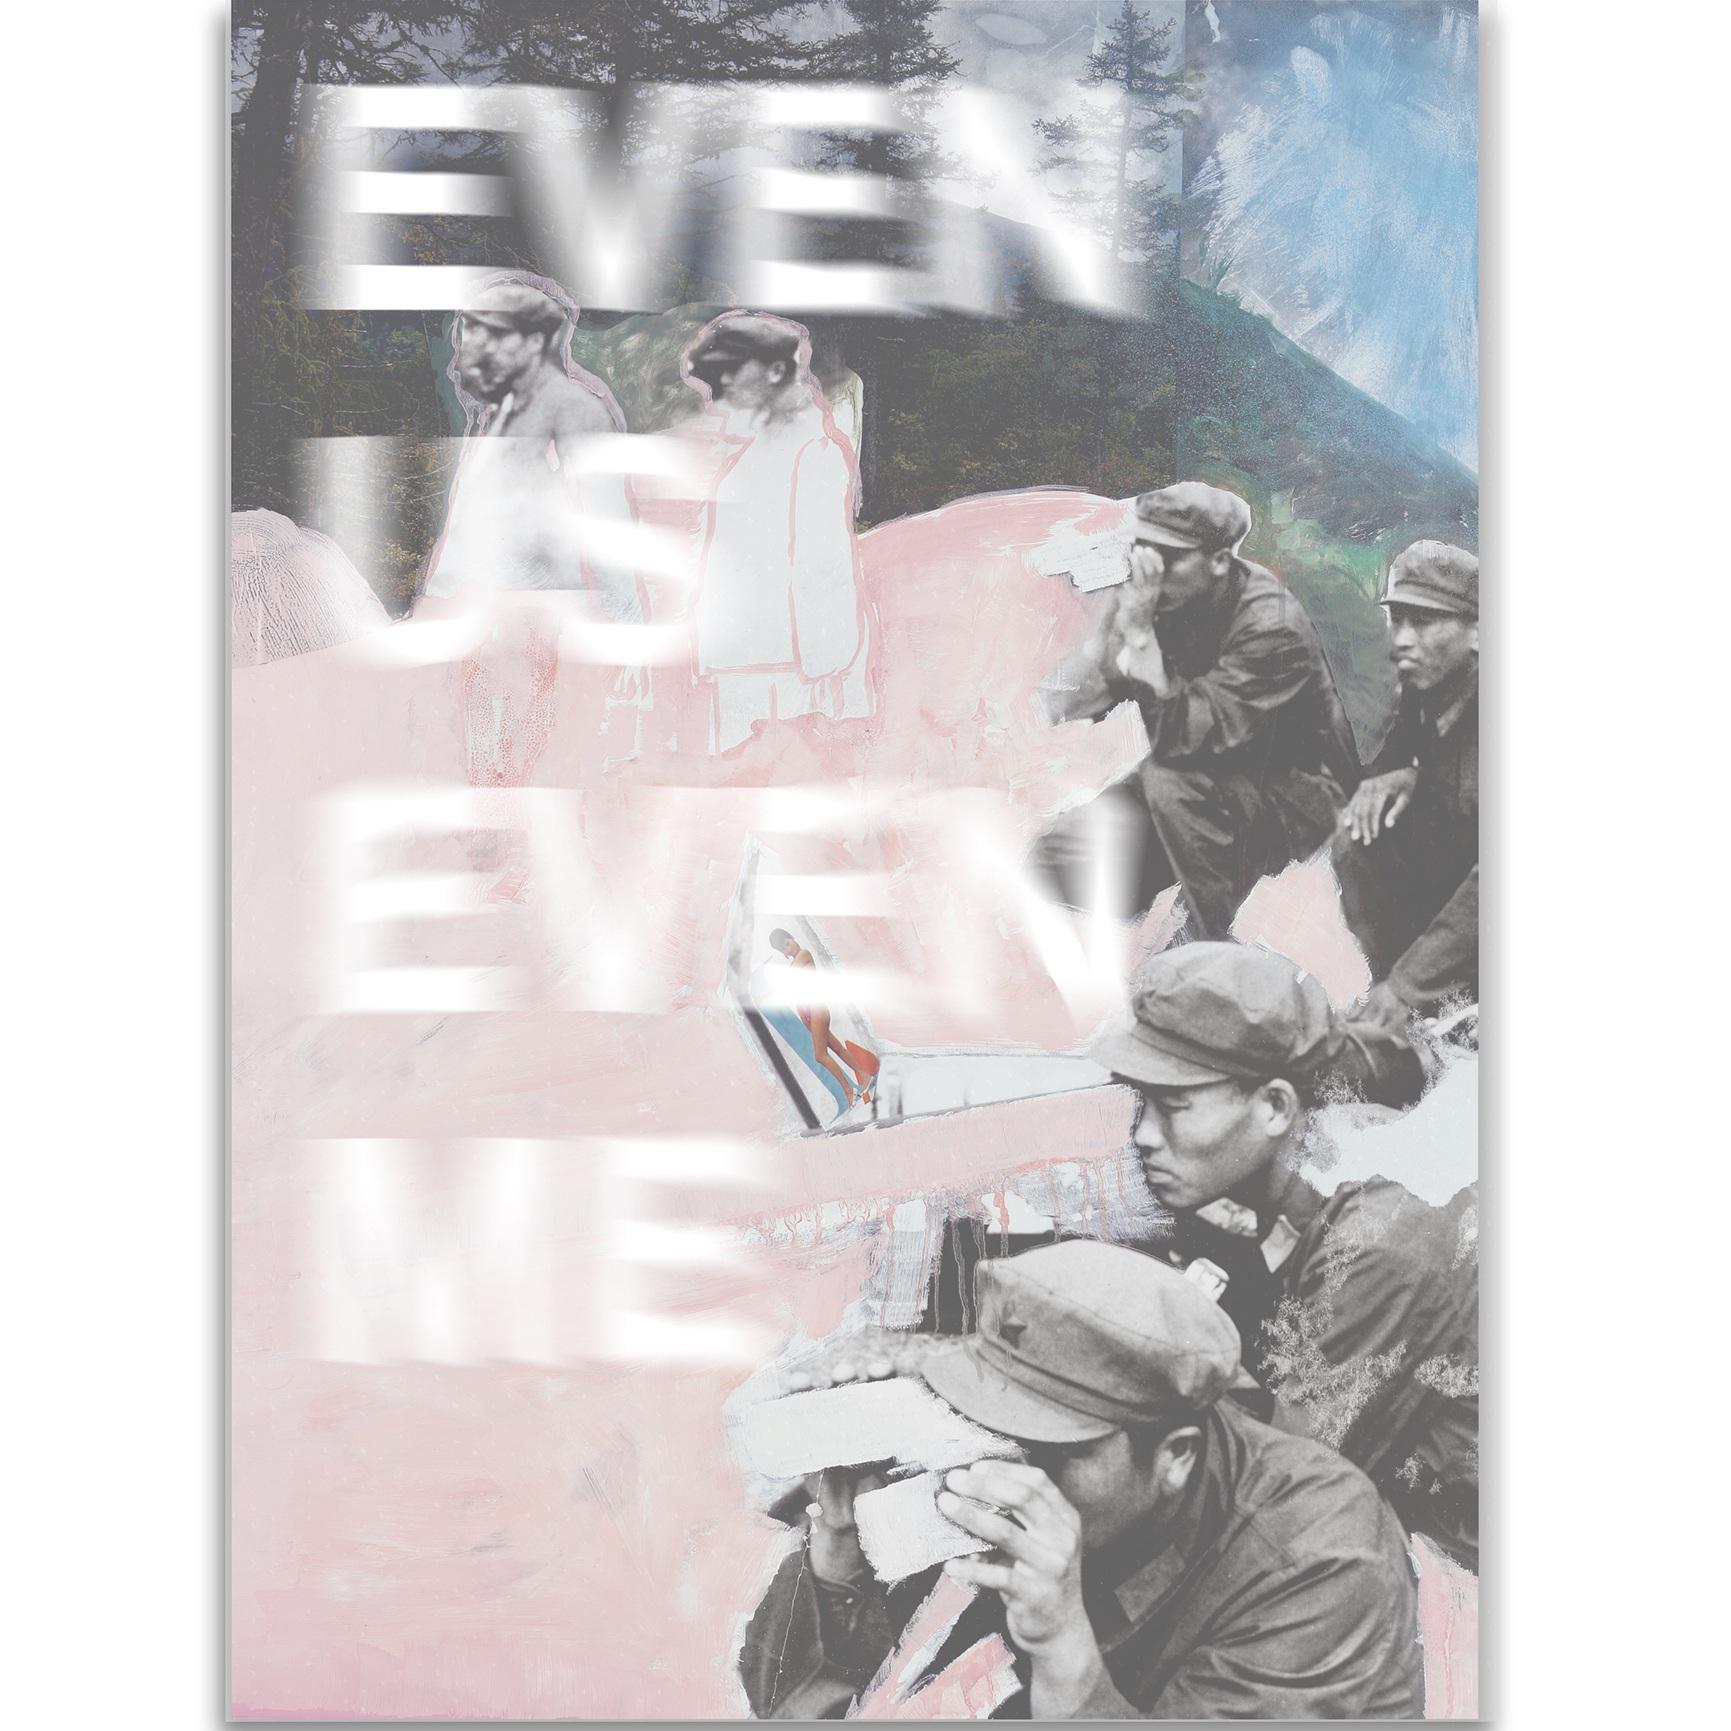 EvenUsEvenMe-Cover.jpg